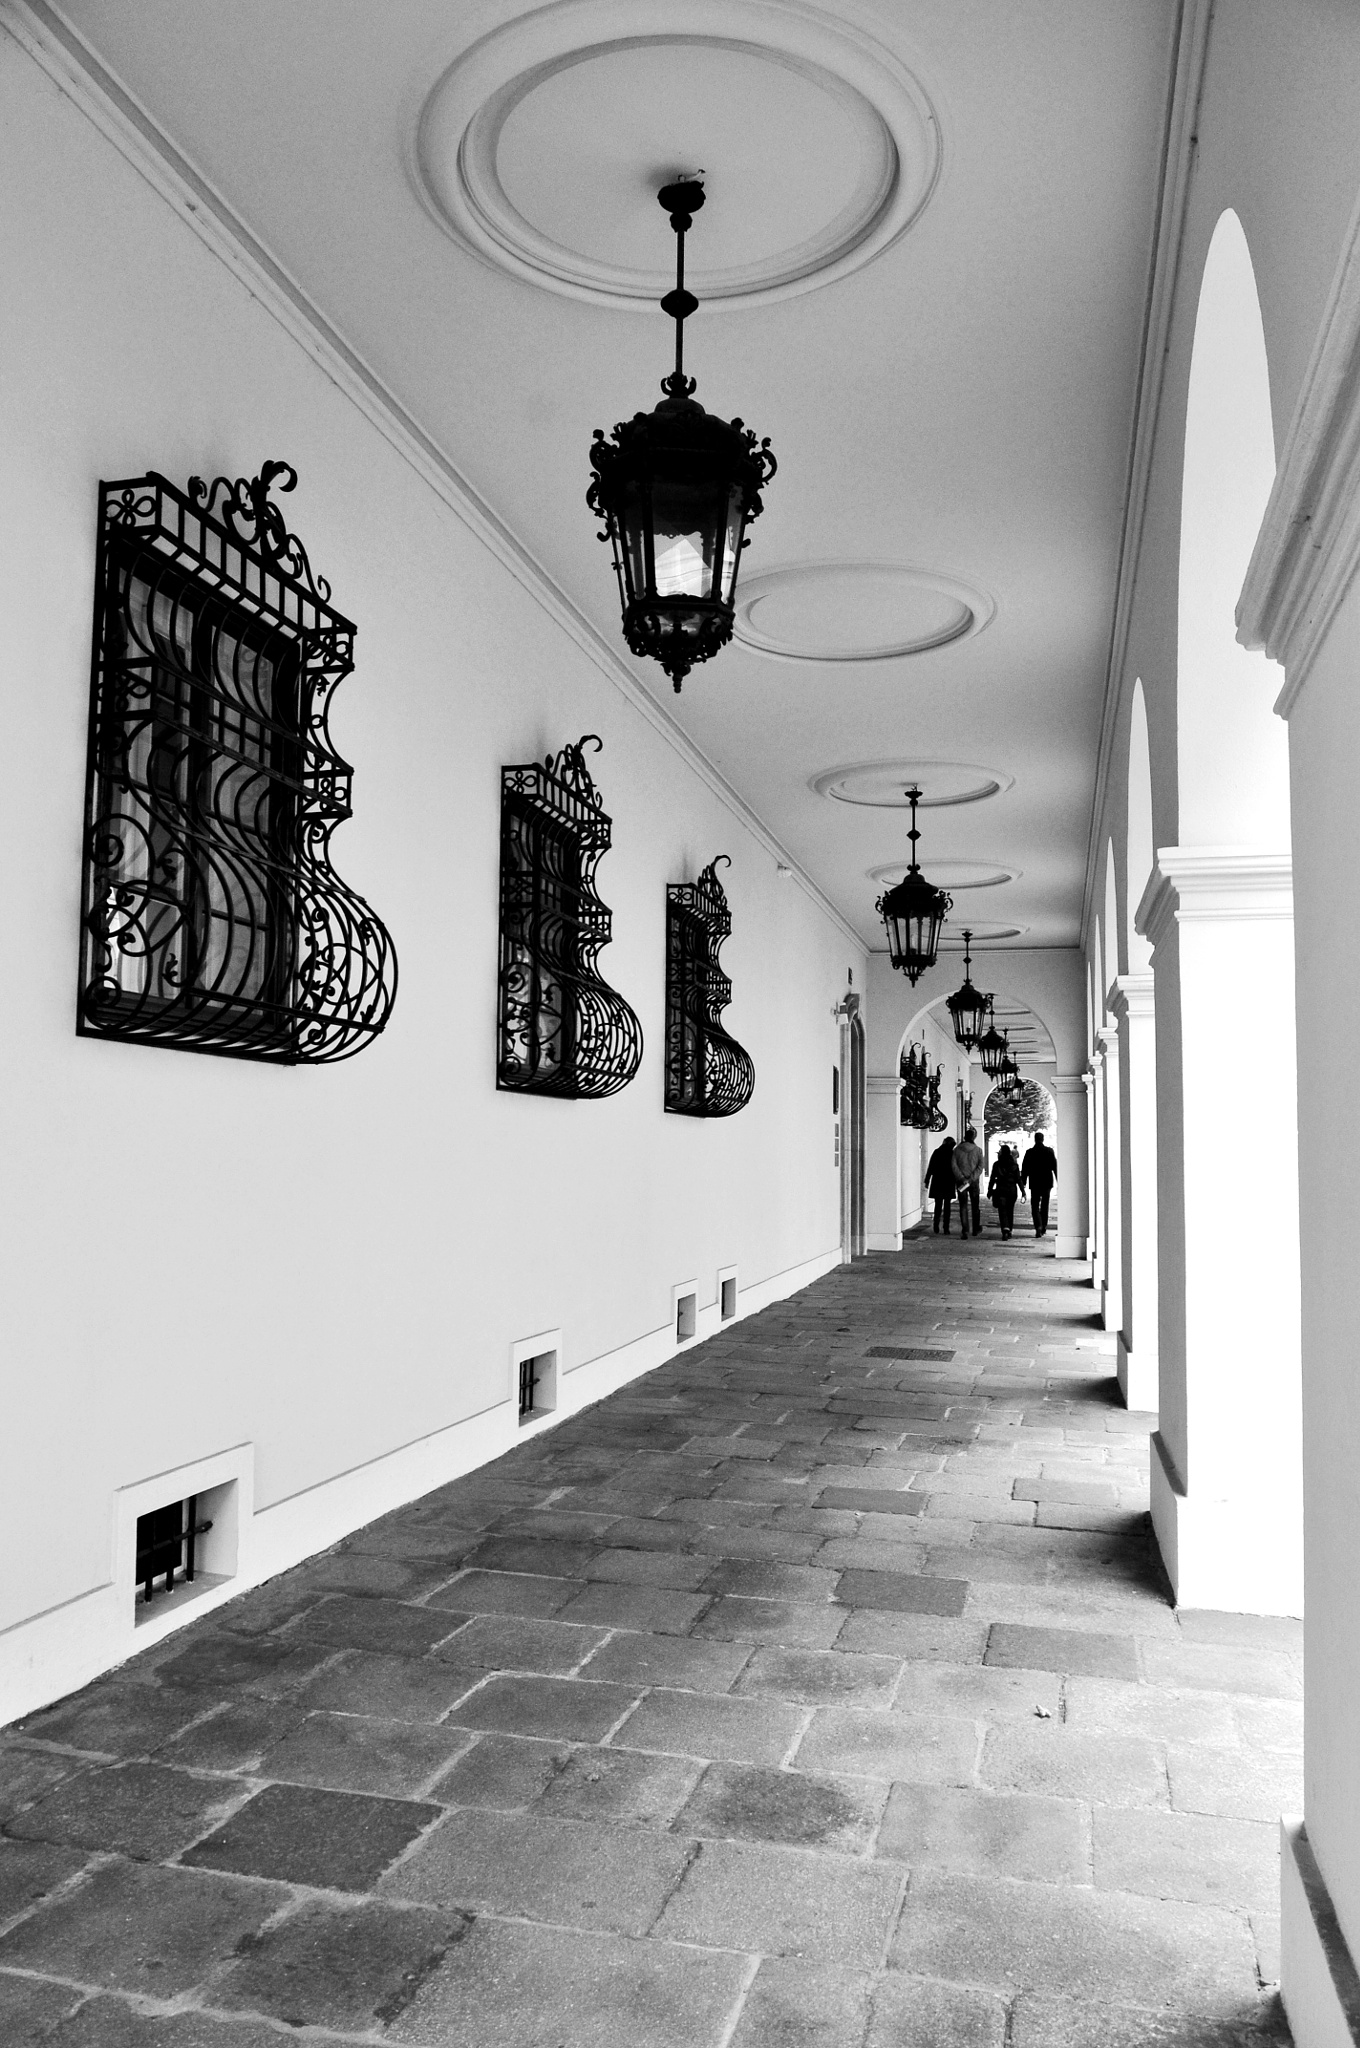 Belvedere by tamara.seles